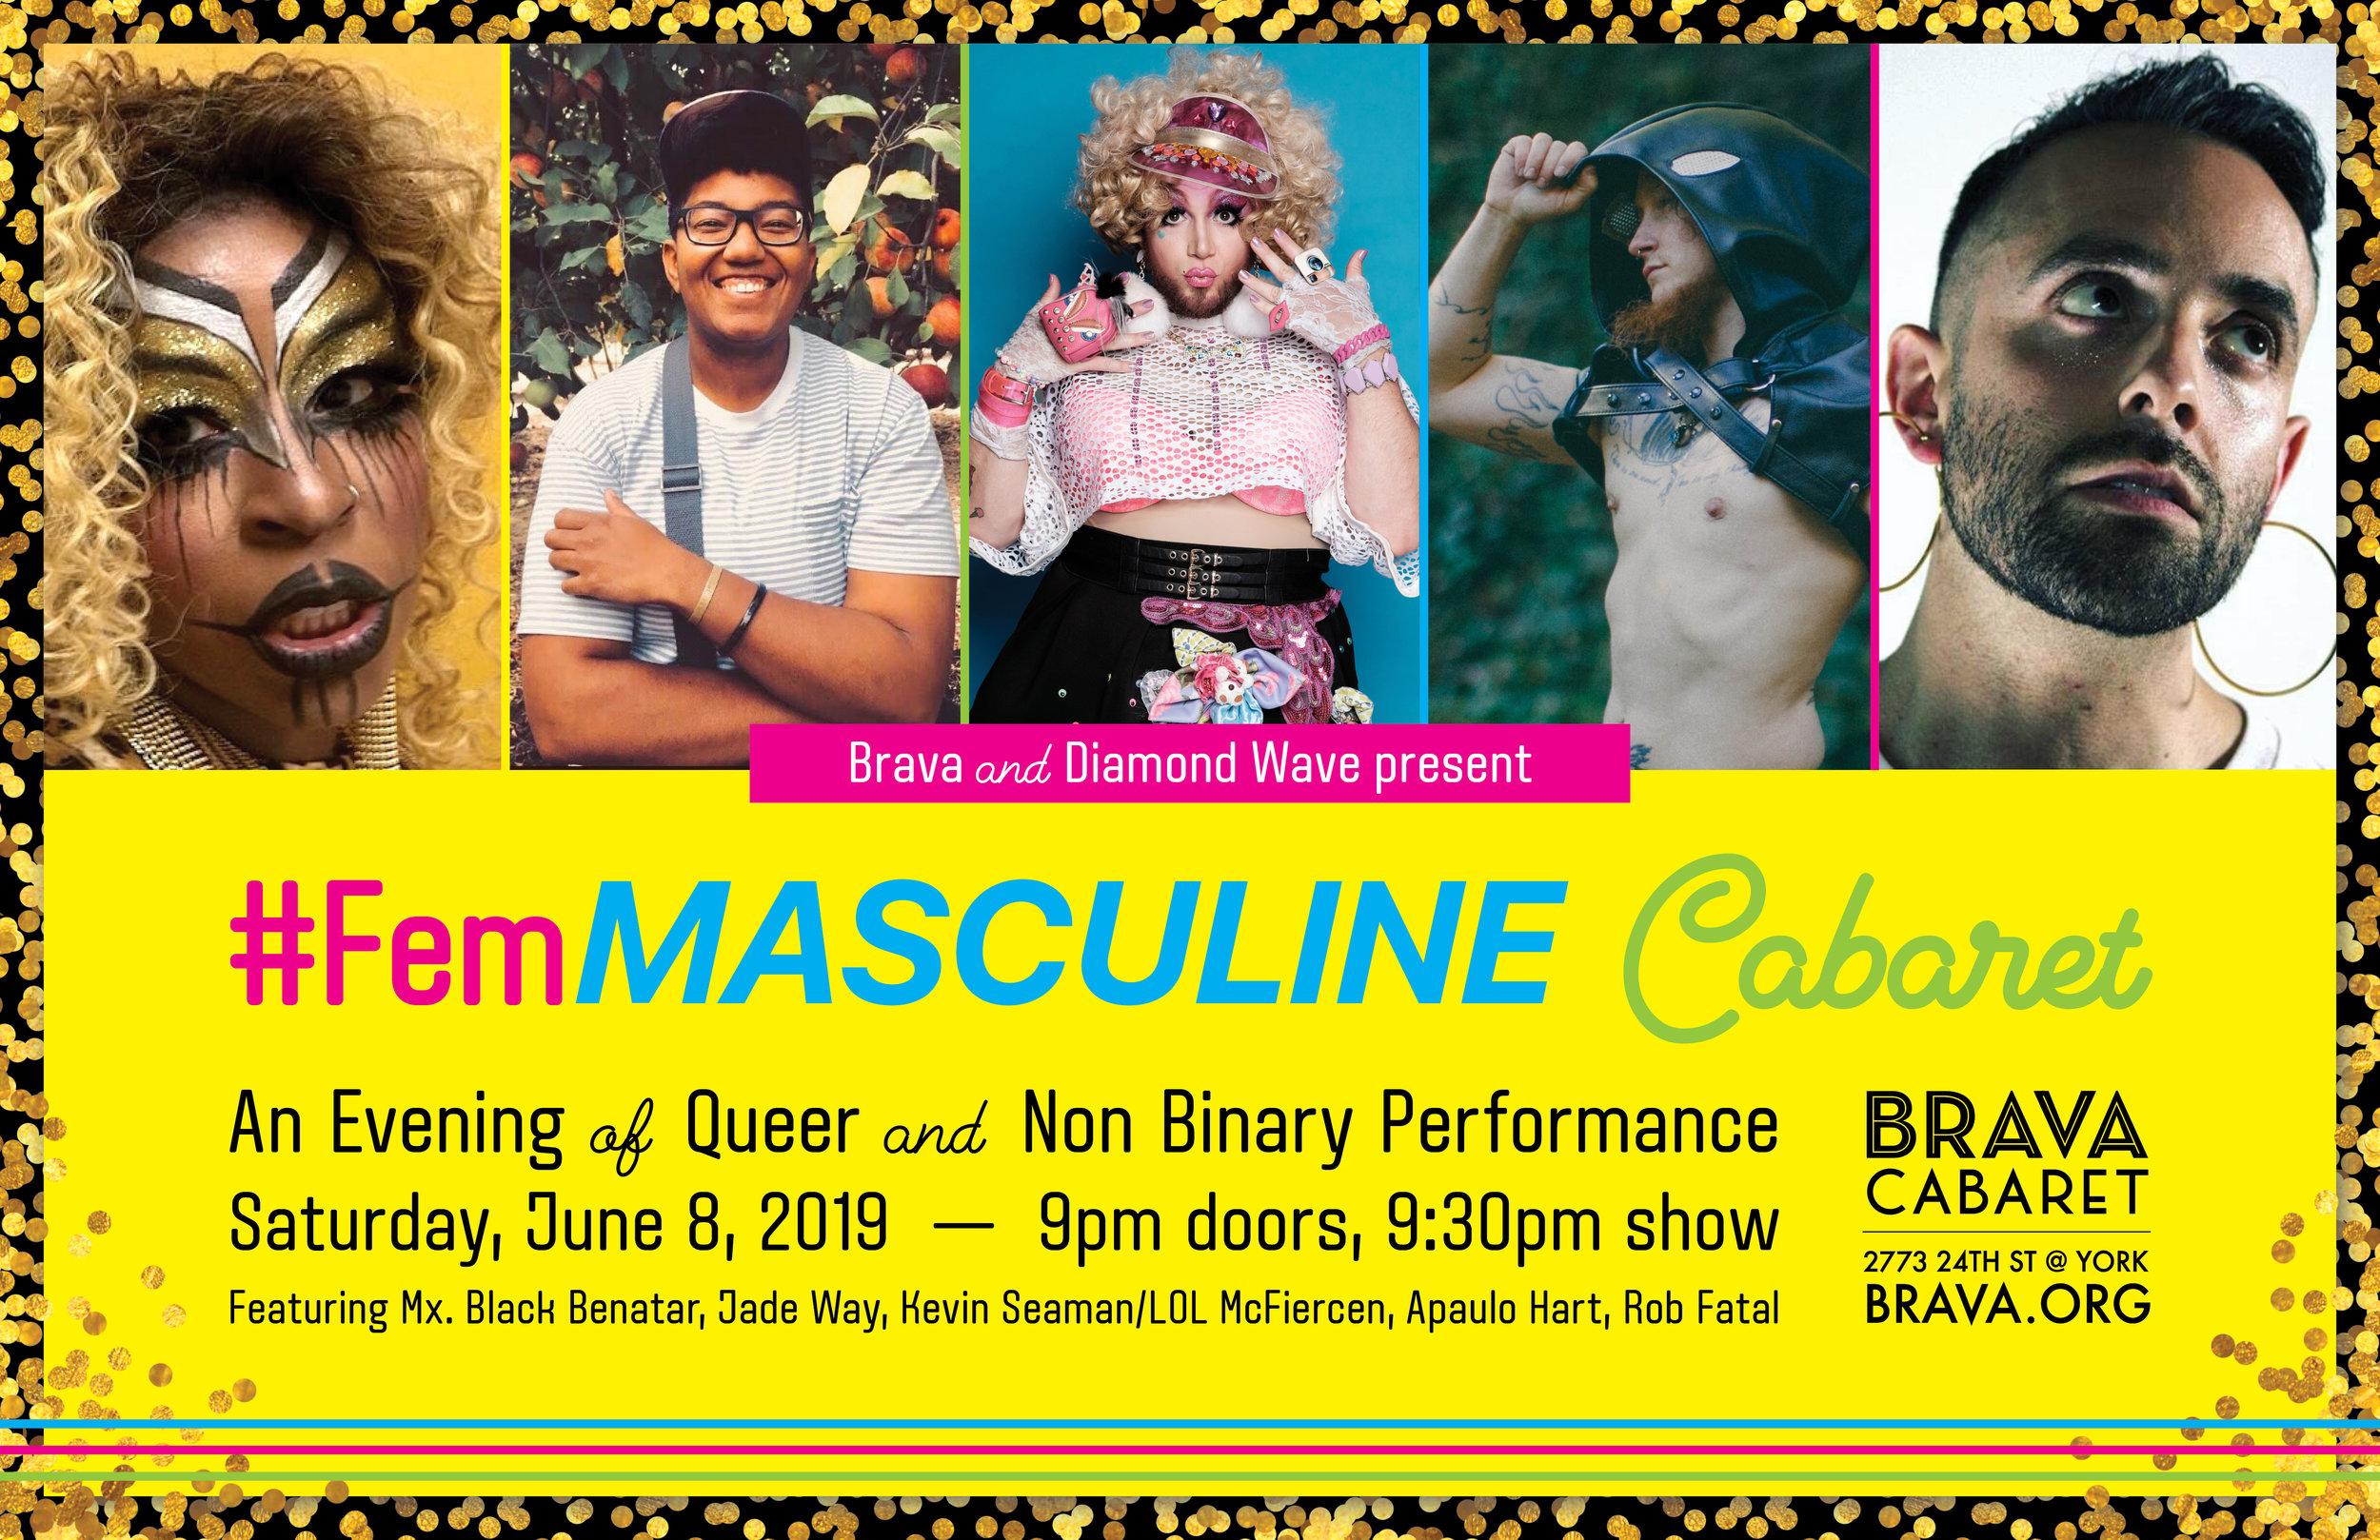 Brava, Femmasculine Cabaret 2019, Door poster 5-23-19.jpg